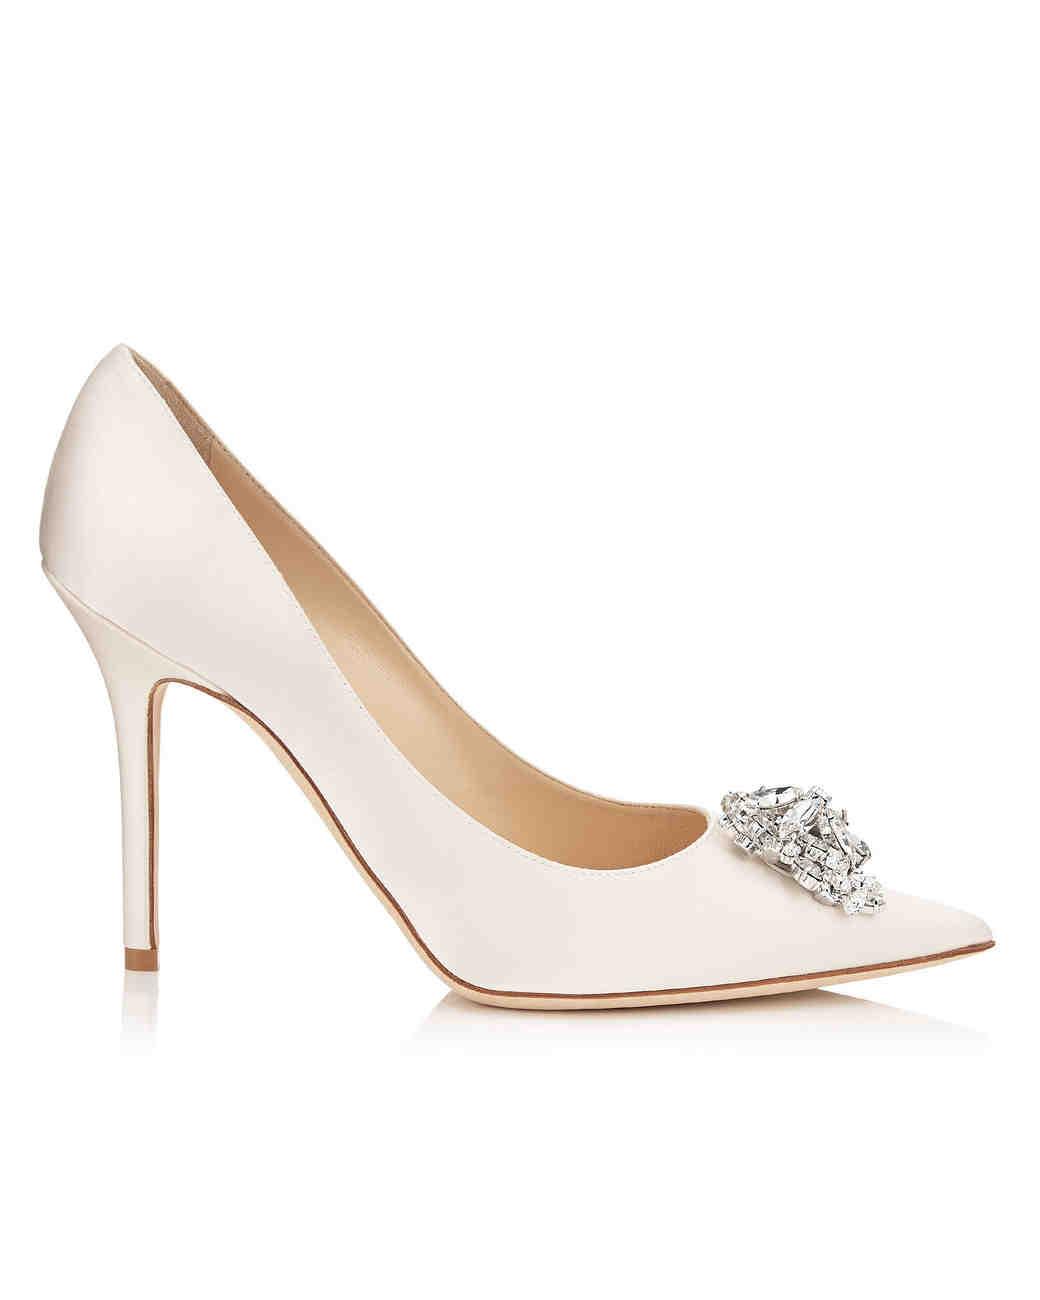 Closed Toe Bridesmaid Shoes